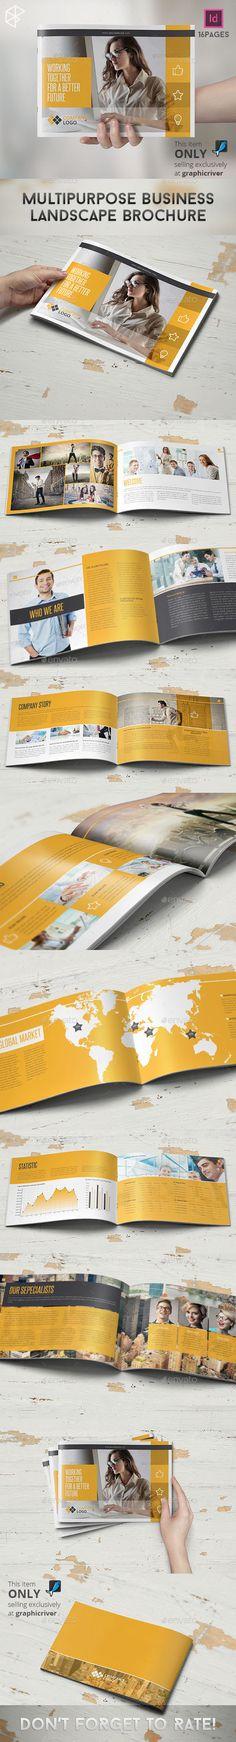 Multipurpose Business Landscape Brochure Template #design Download: http://graphicriver.net/item/multipurpose-business-landscape-brochure/10302654?ref=ksioks